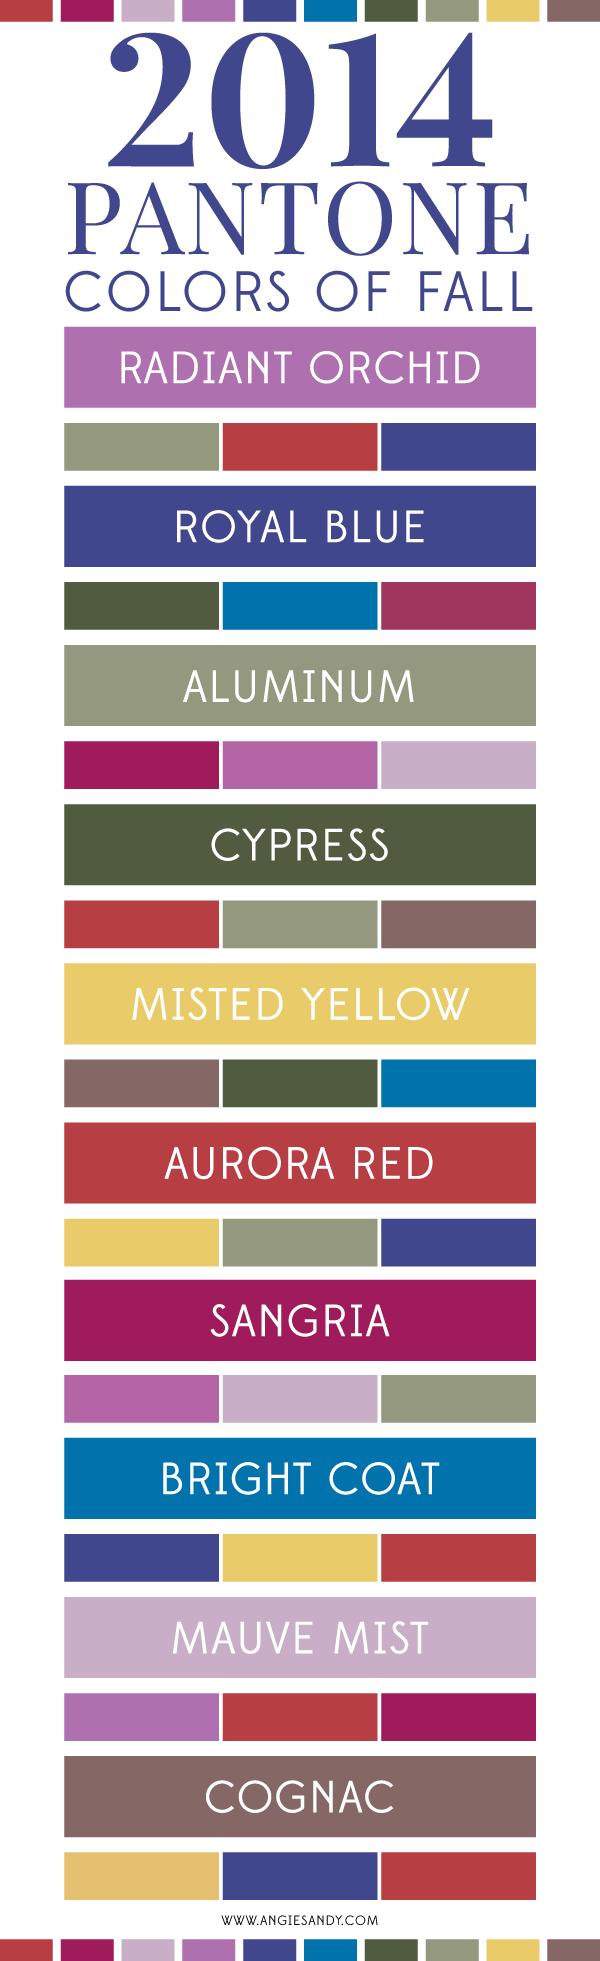 Pantone Colors of Fall 2014 | Angie Sandy Art Licensing & Design #pantone #colorpalette